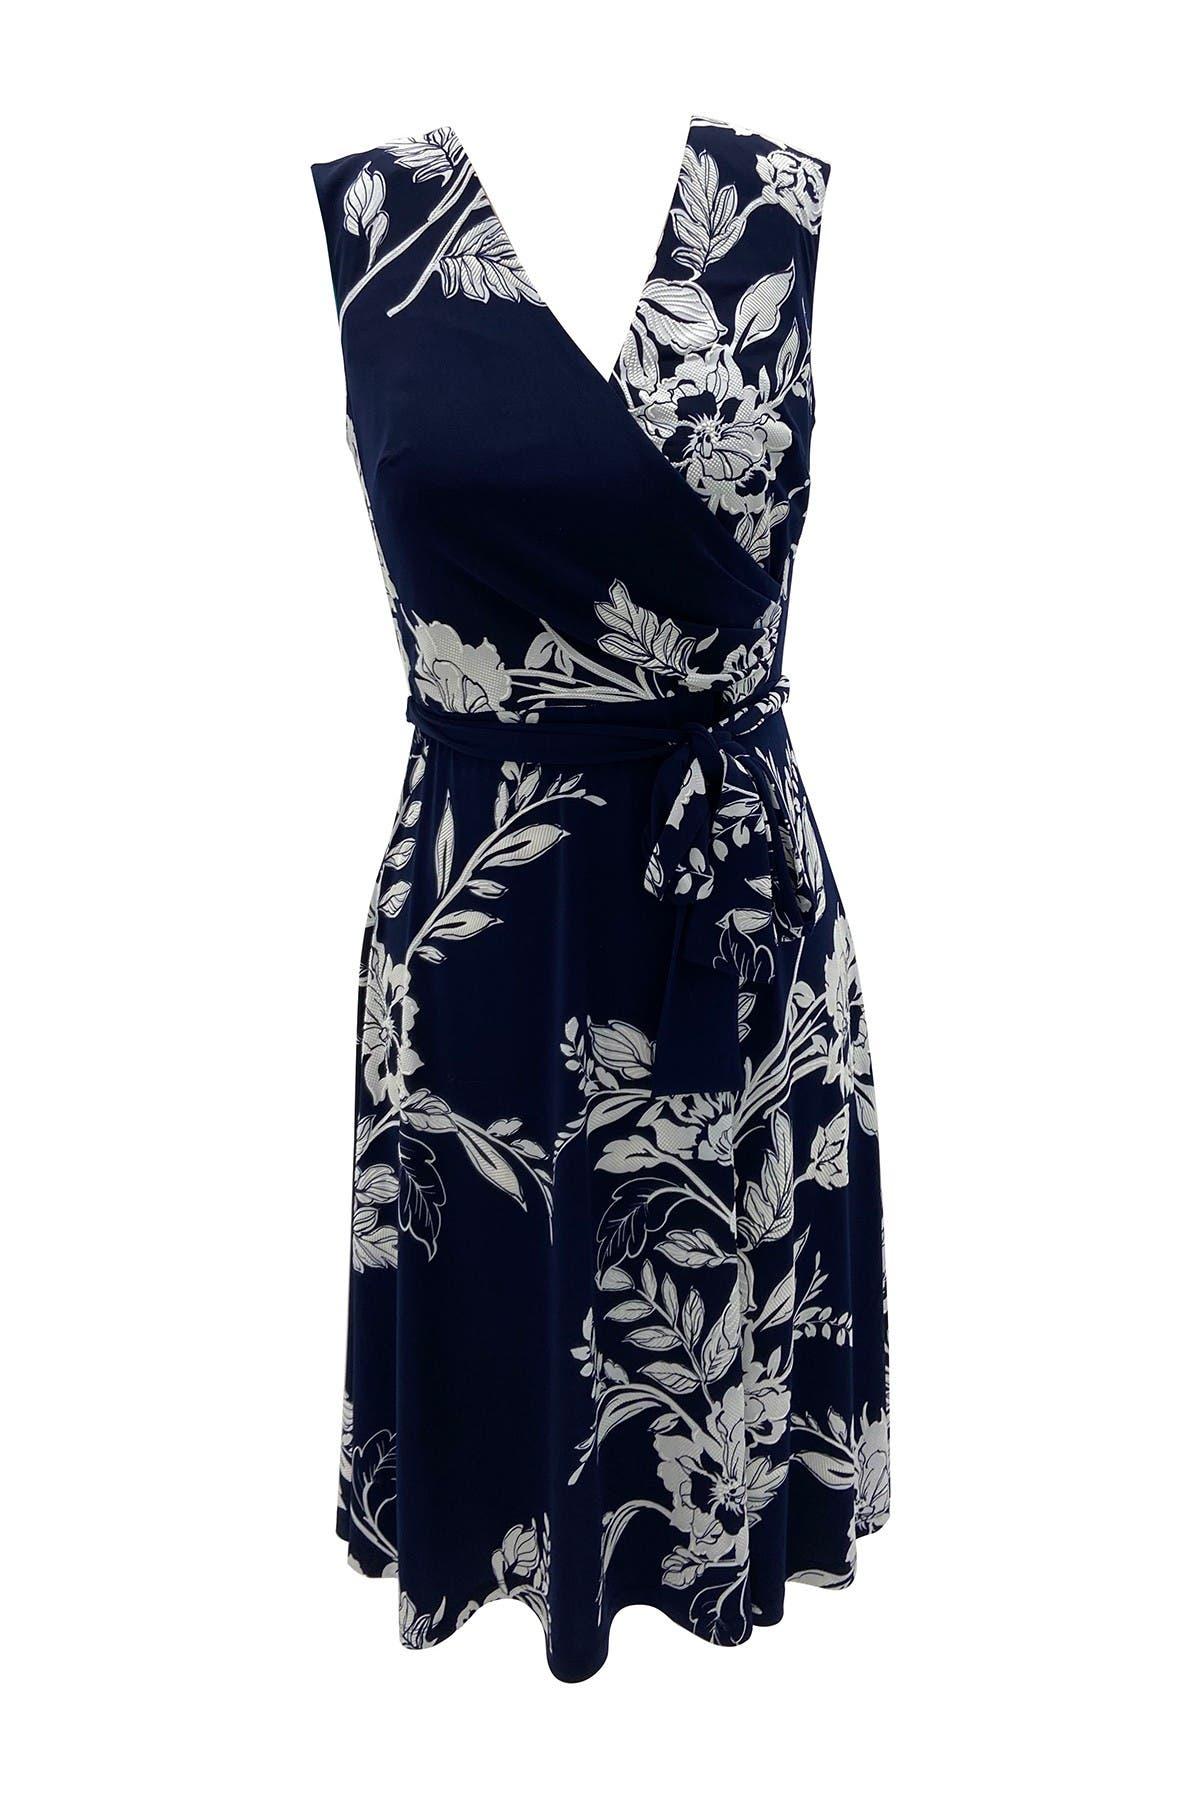 Image of Sandra Darren Sleeveless Faux Wrap ITY Knit Fit & Flare Dress